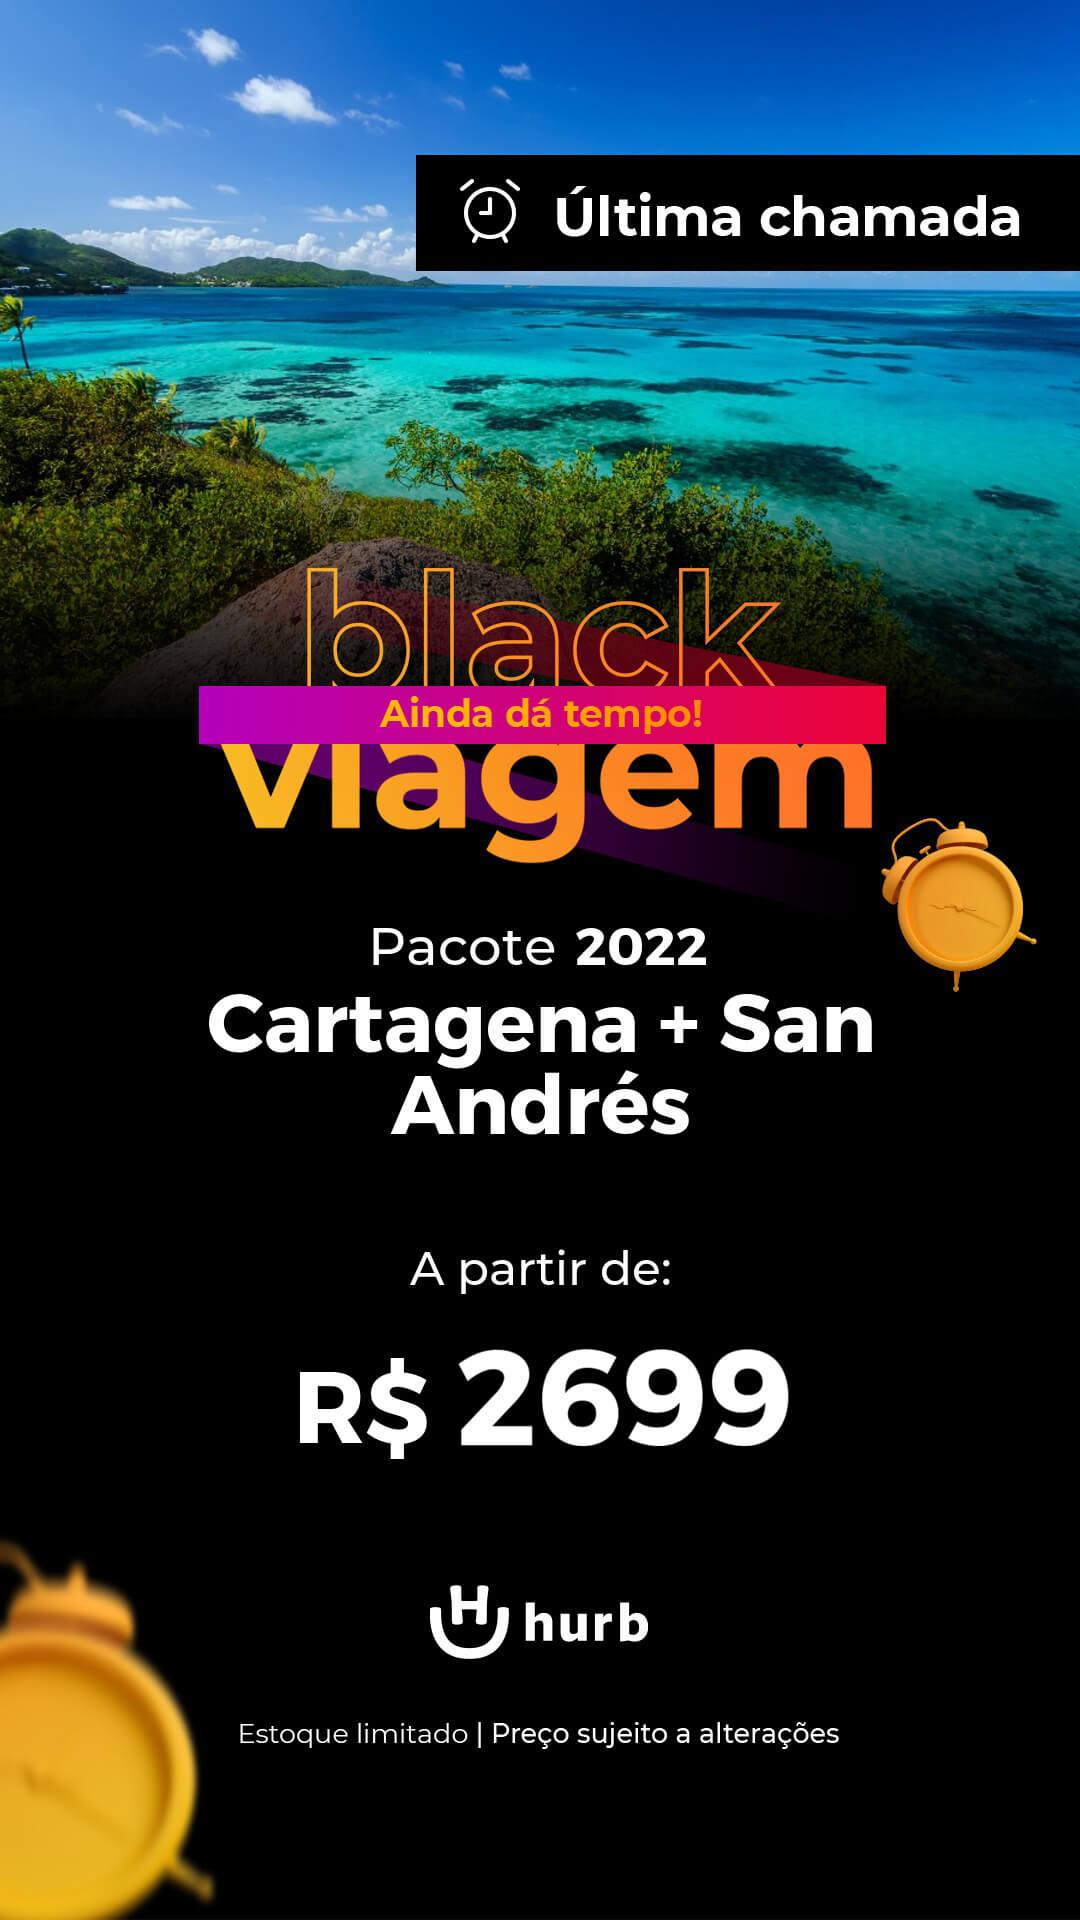 pacote cartagena san andres 2022